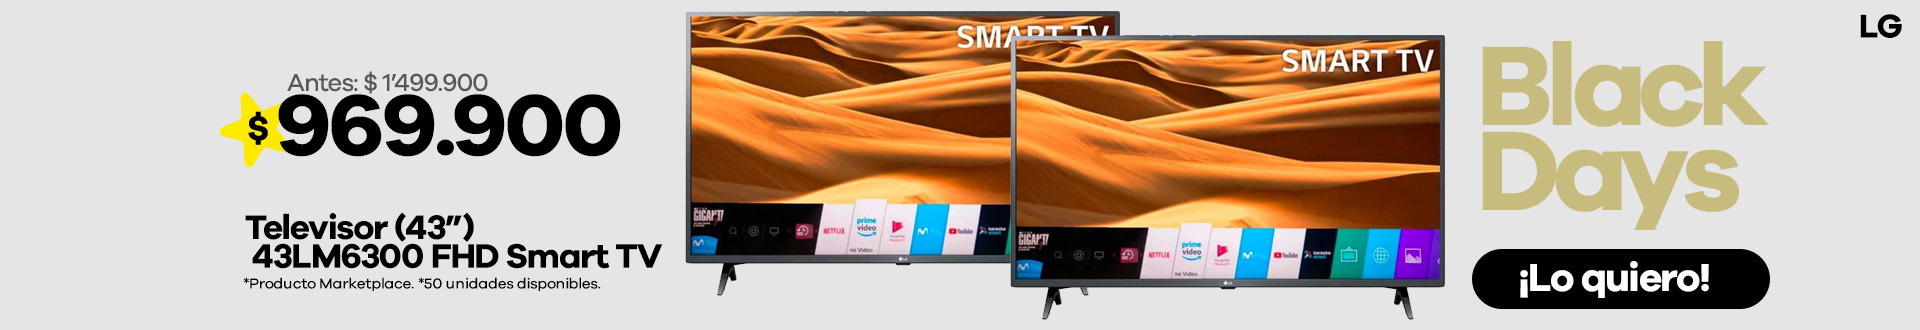 televisor-43-pulgadas-lg-43lm6300-fhd-smart-tv